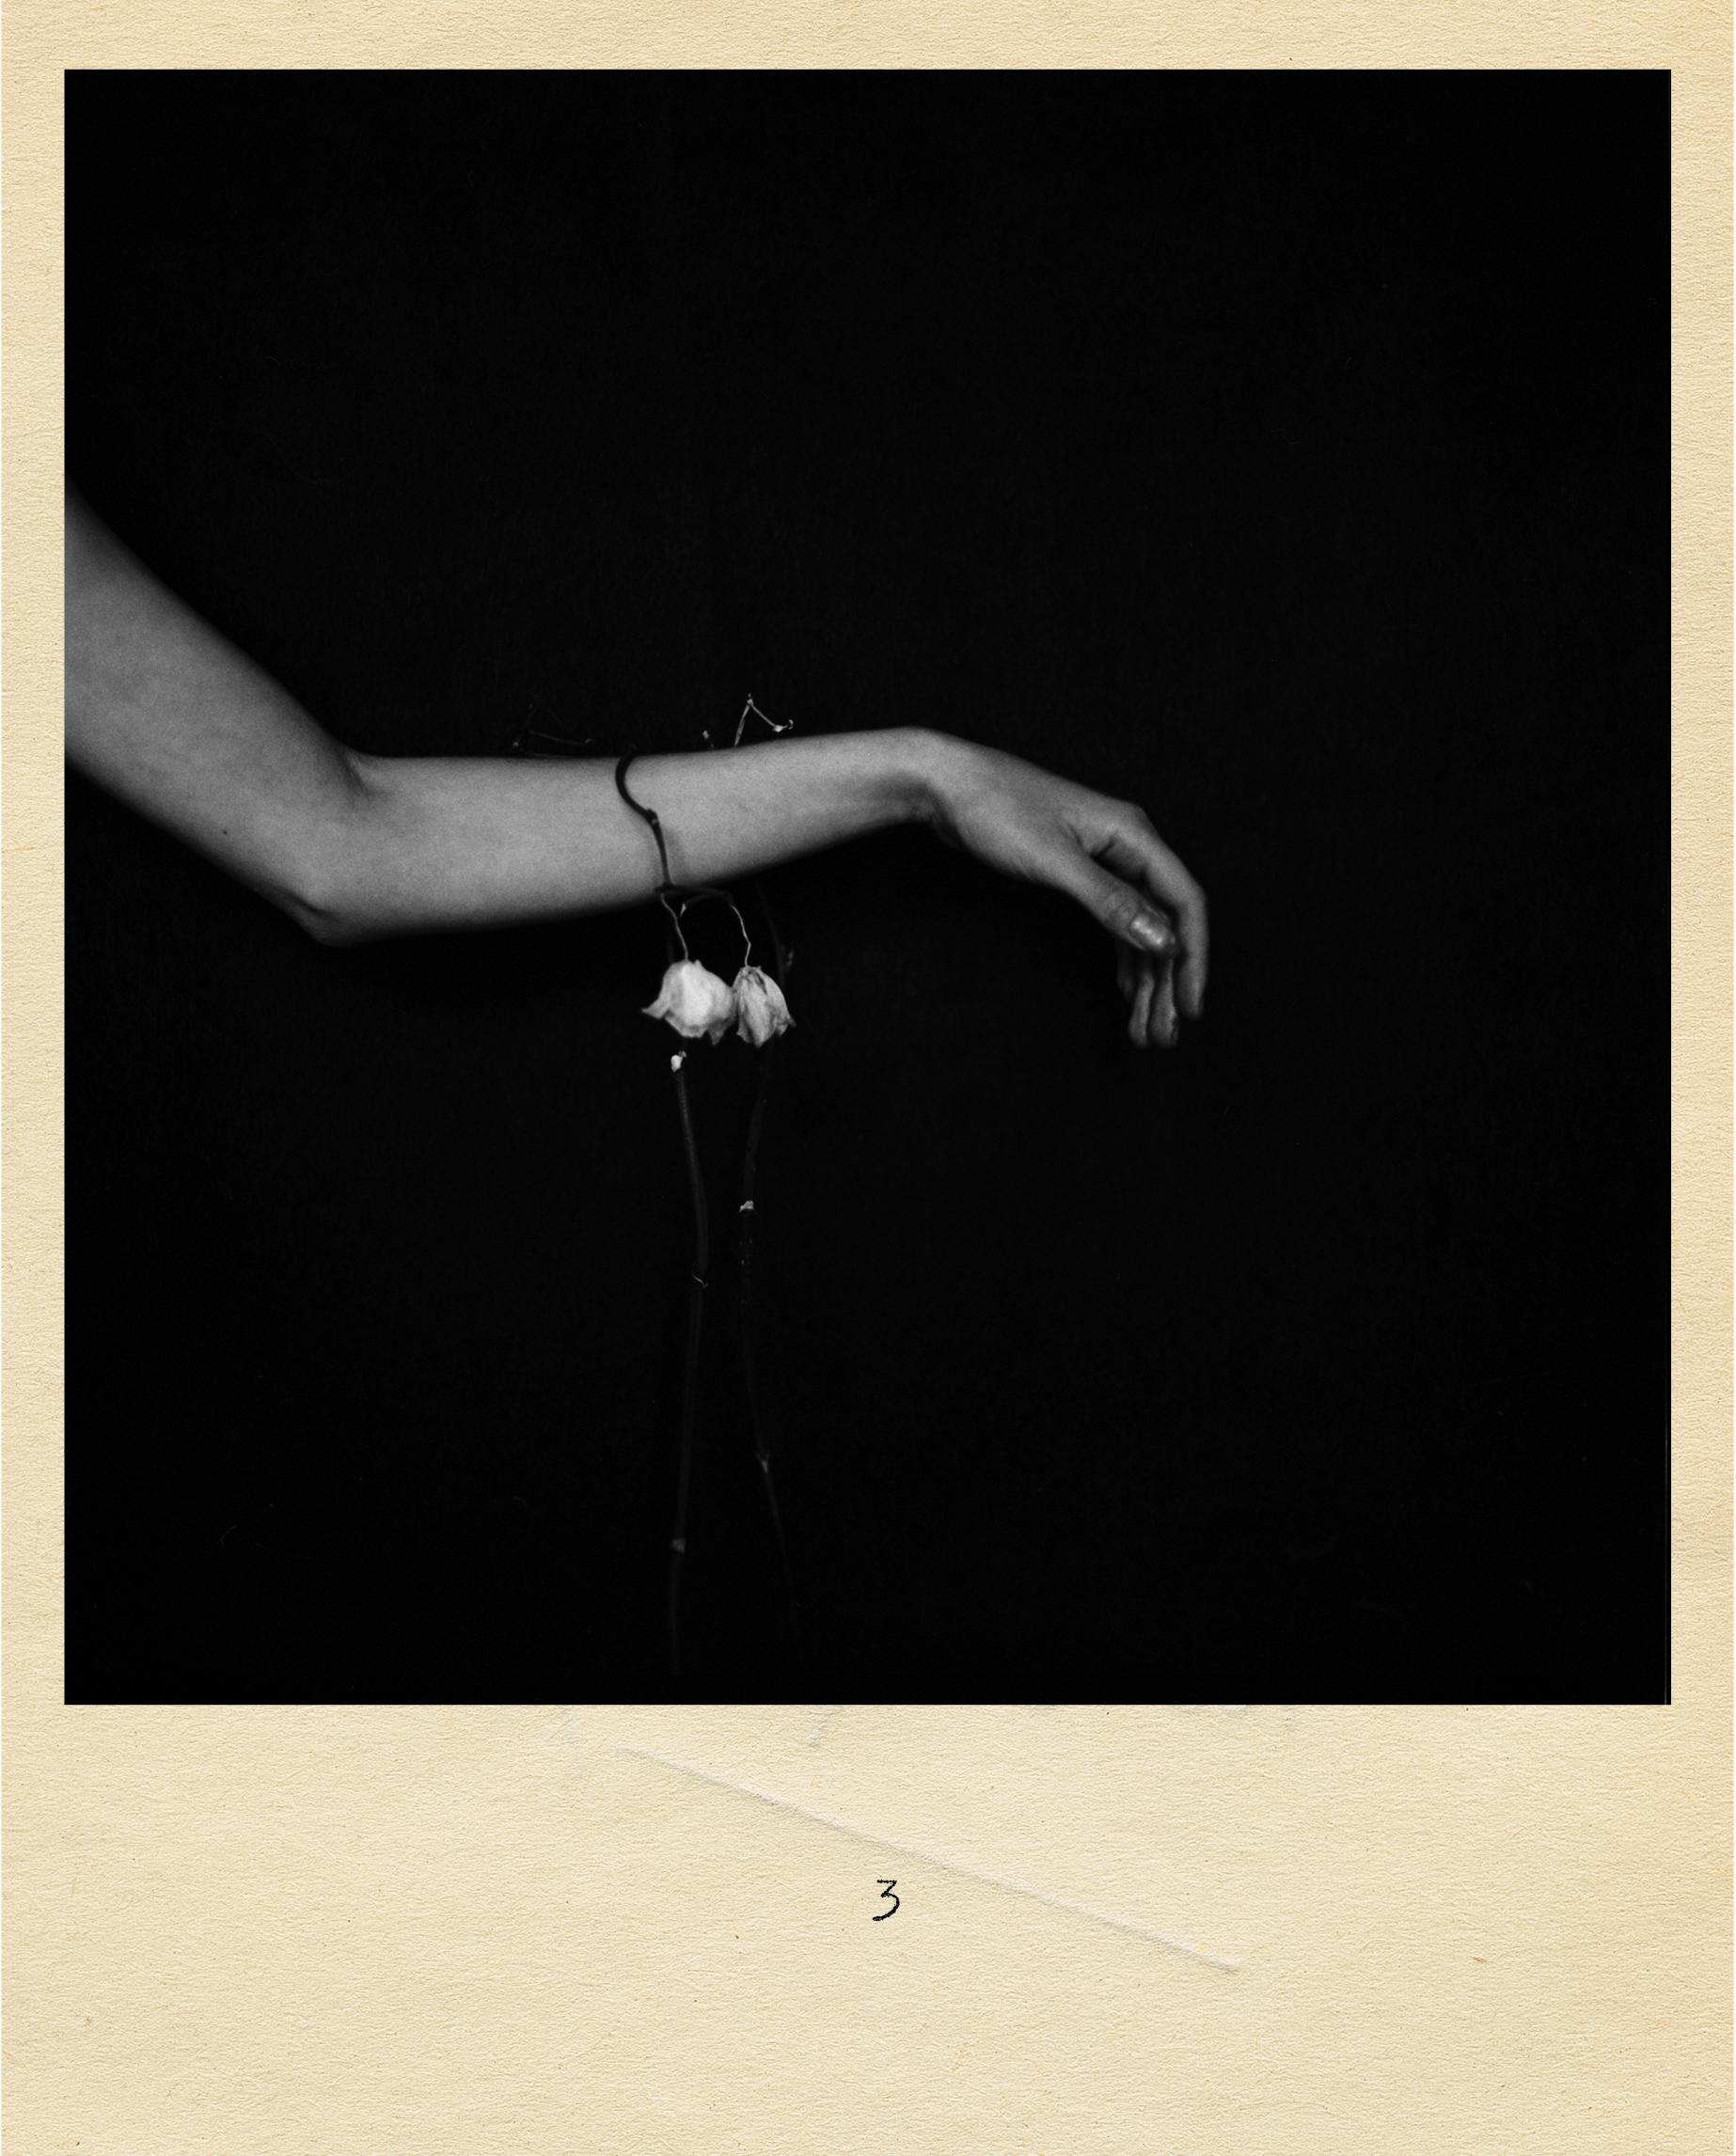 Samana, Samana Music, Samana Photography, Samana Band, Black and white, Rebecca Rose Harris